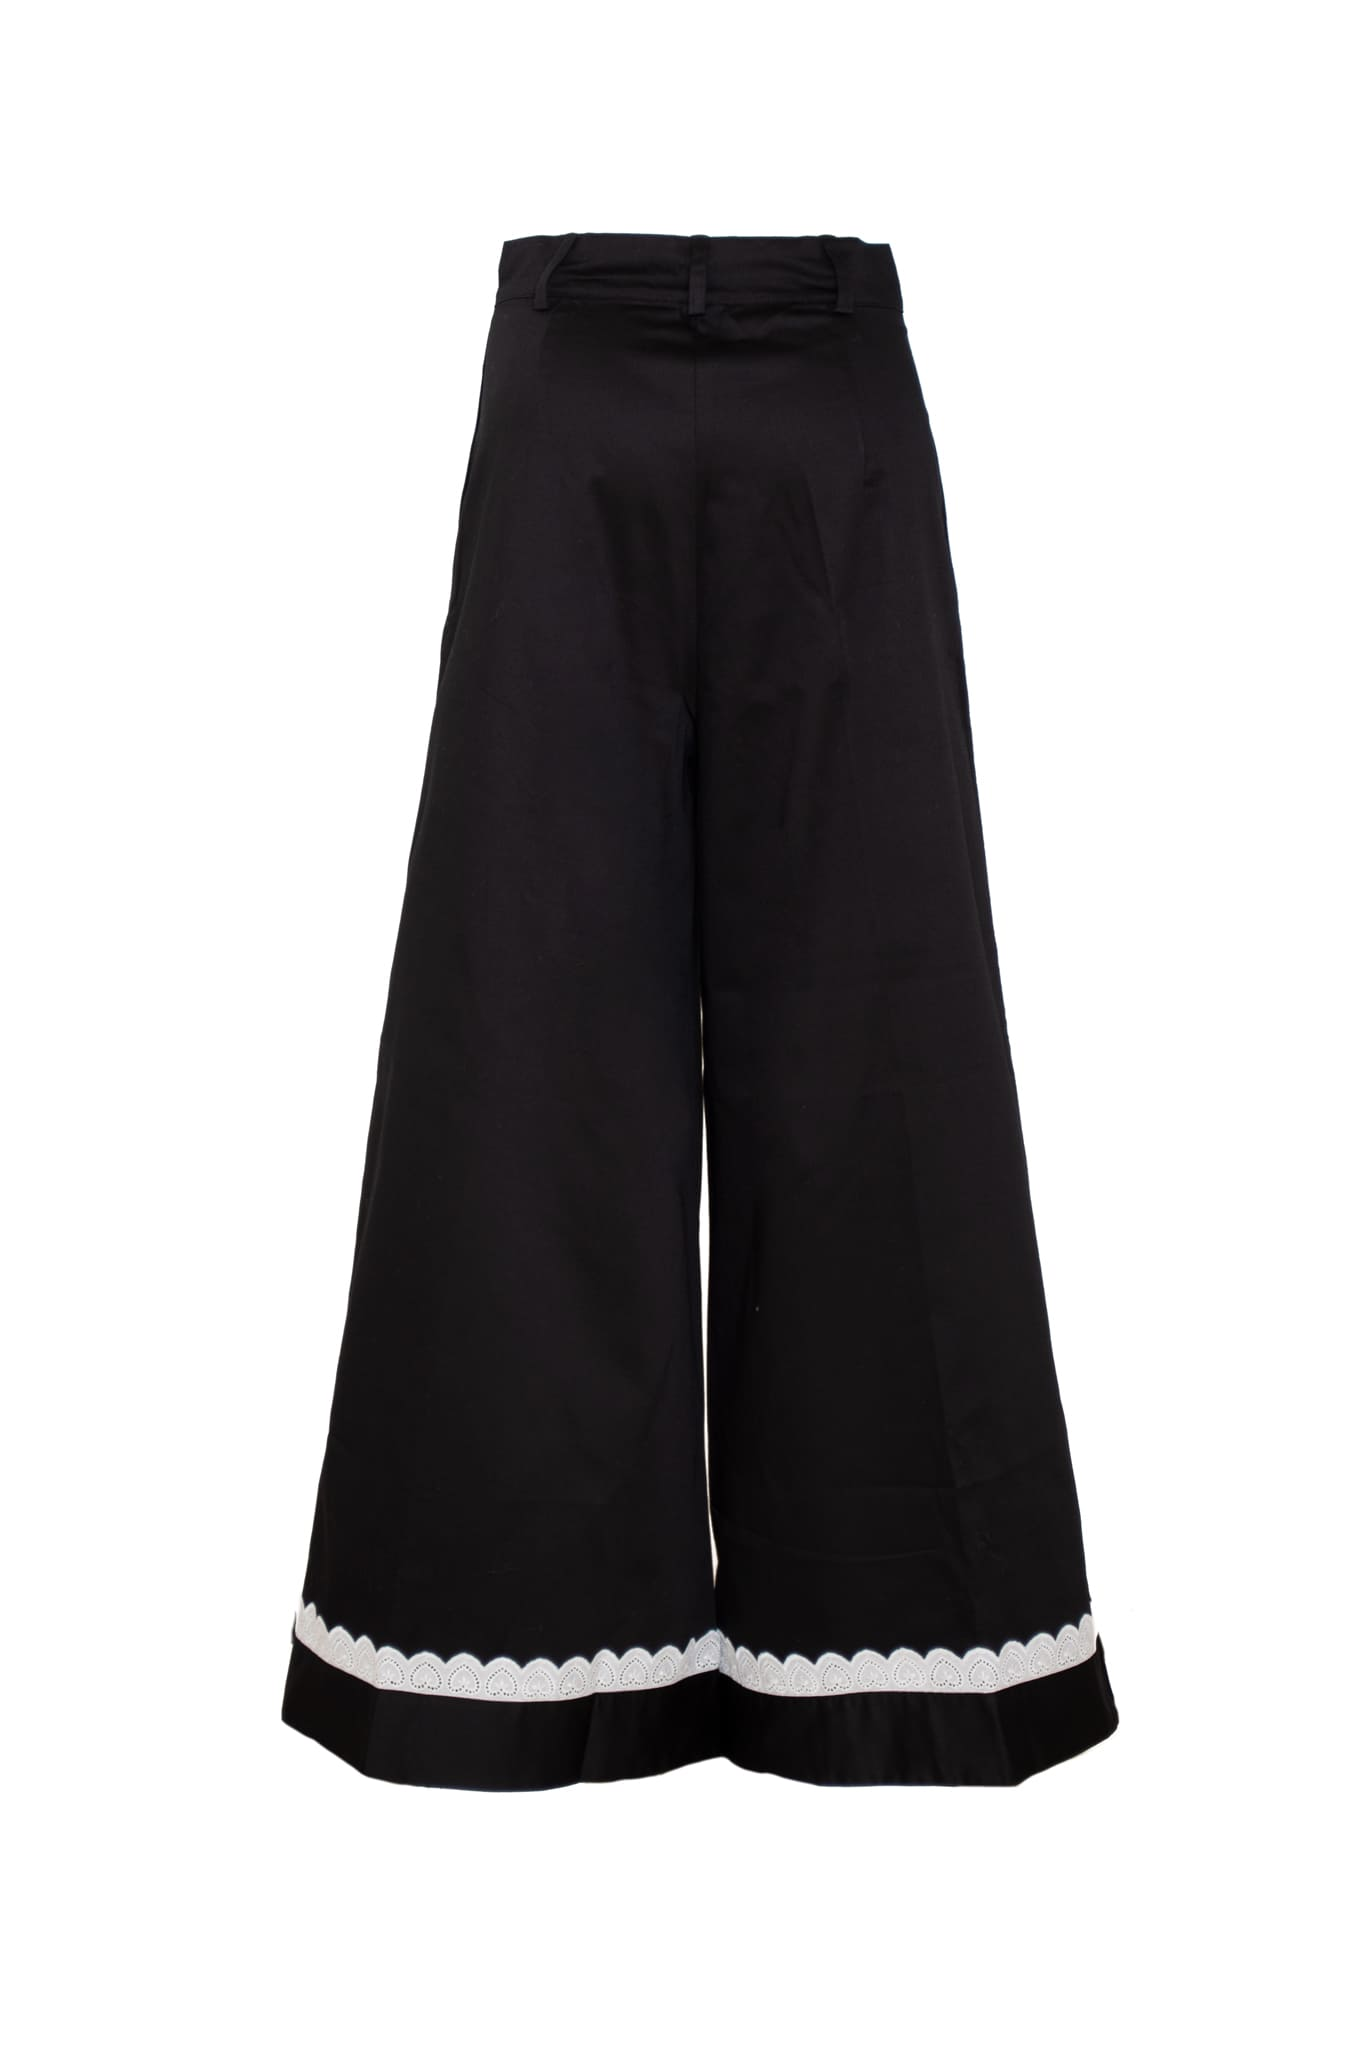 ropa-pantalon-the-wishful-thinker-anniehc-atizz (2)